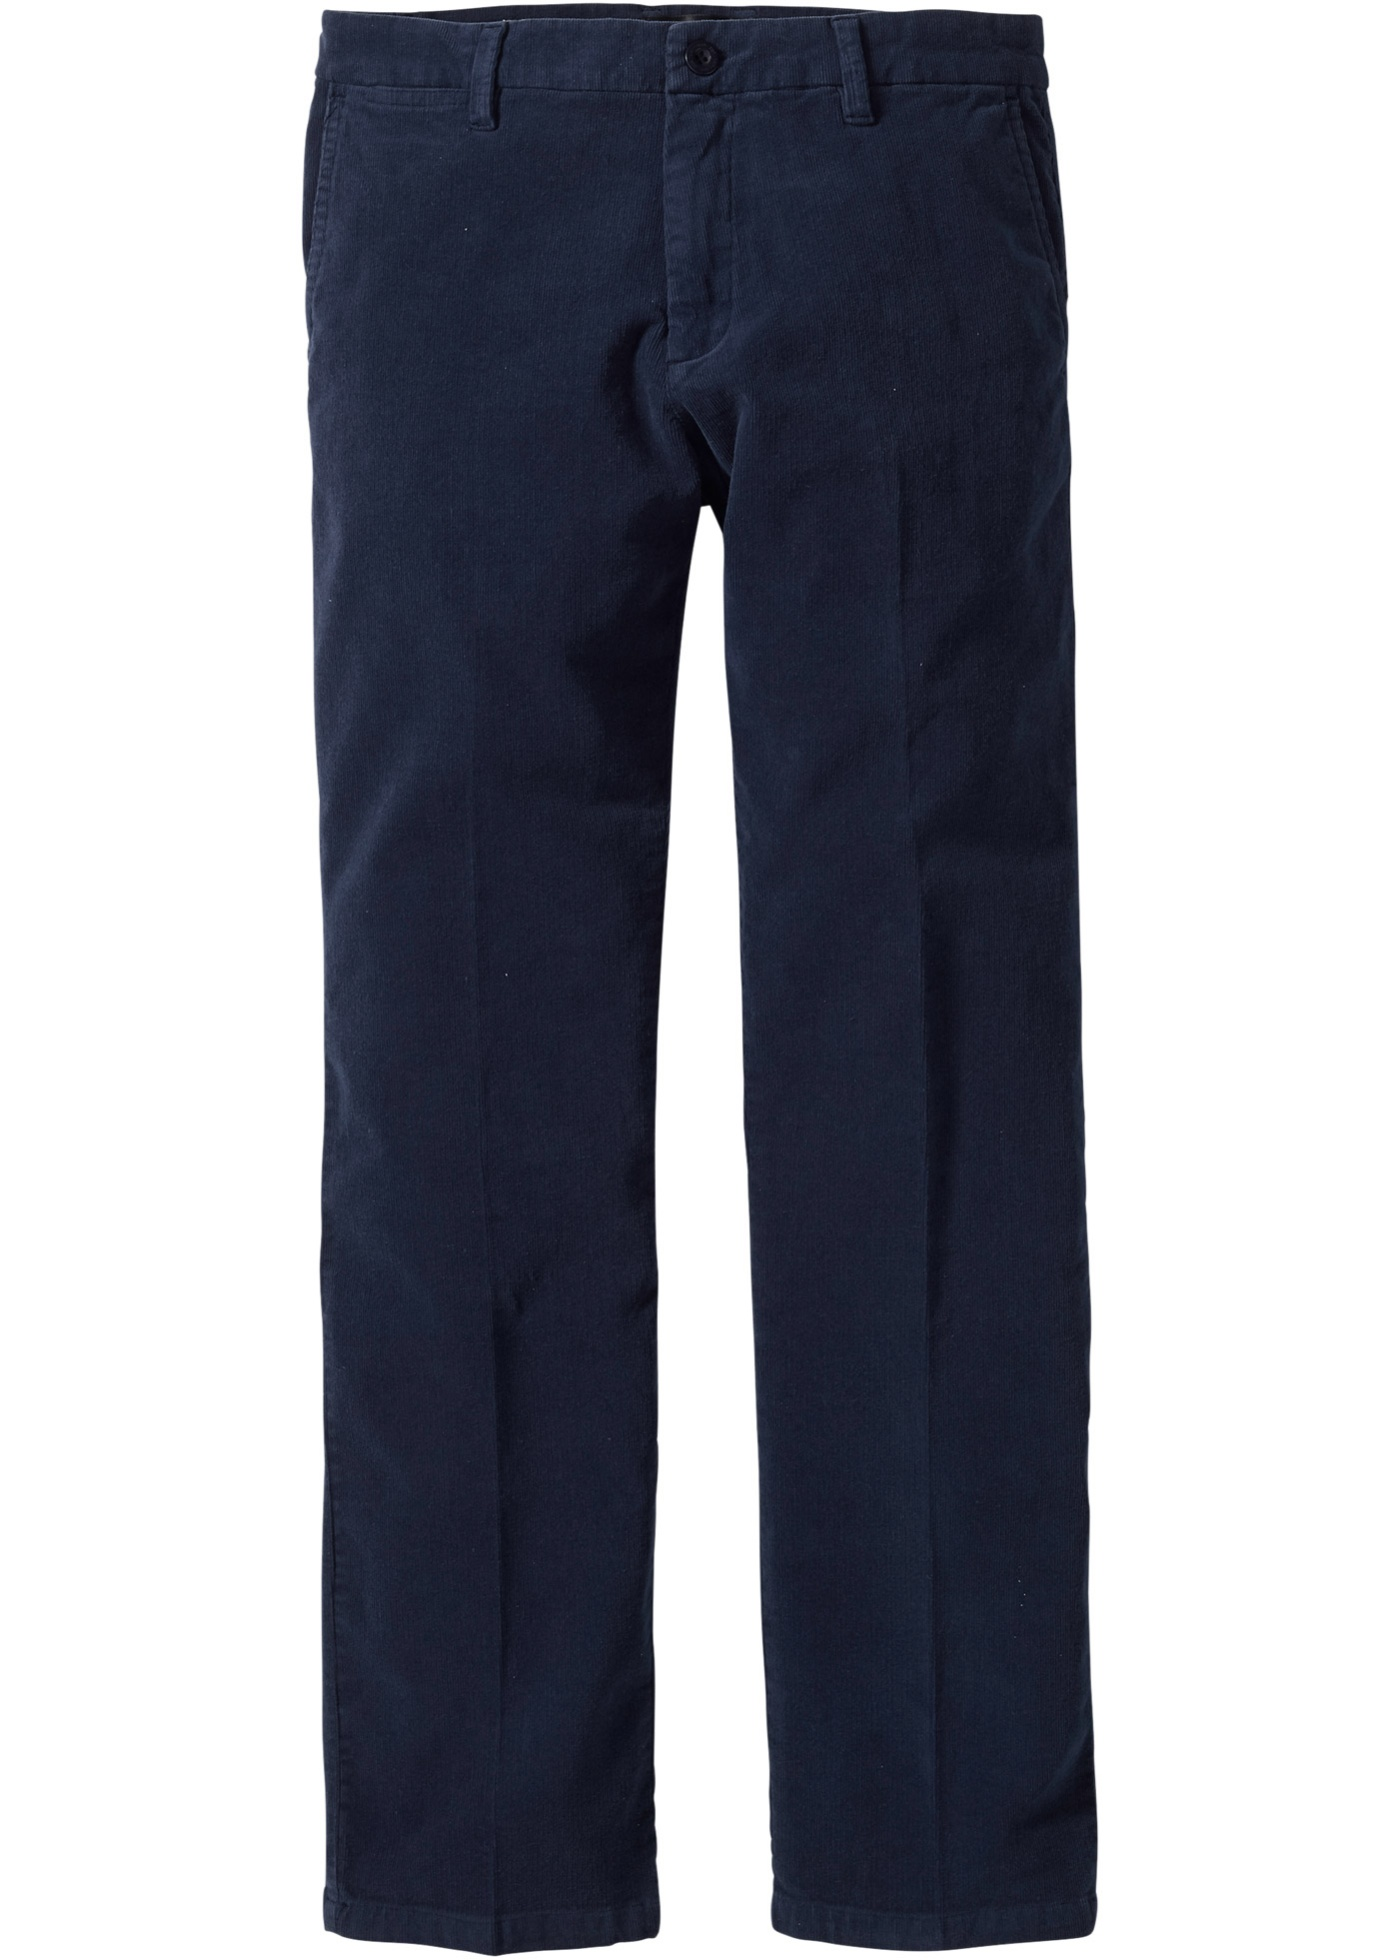 Pantalone chino in vellut